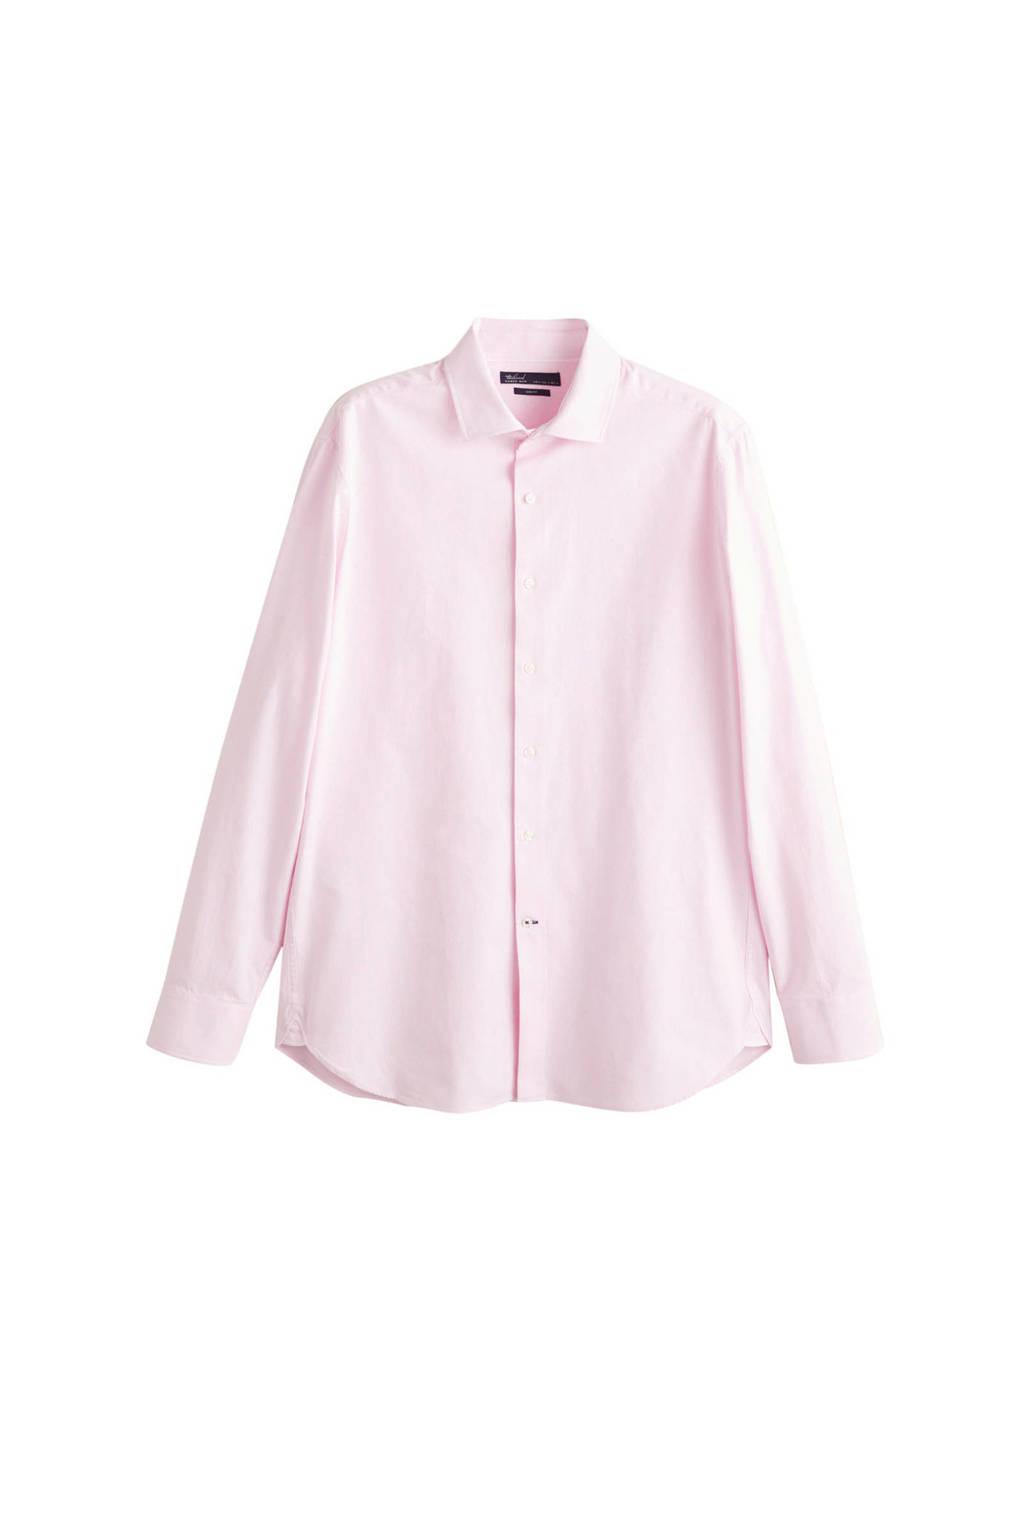 Mango Man katoenen overhemd, Roze